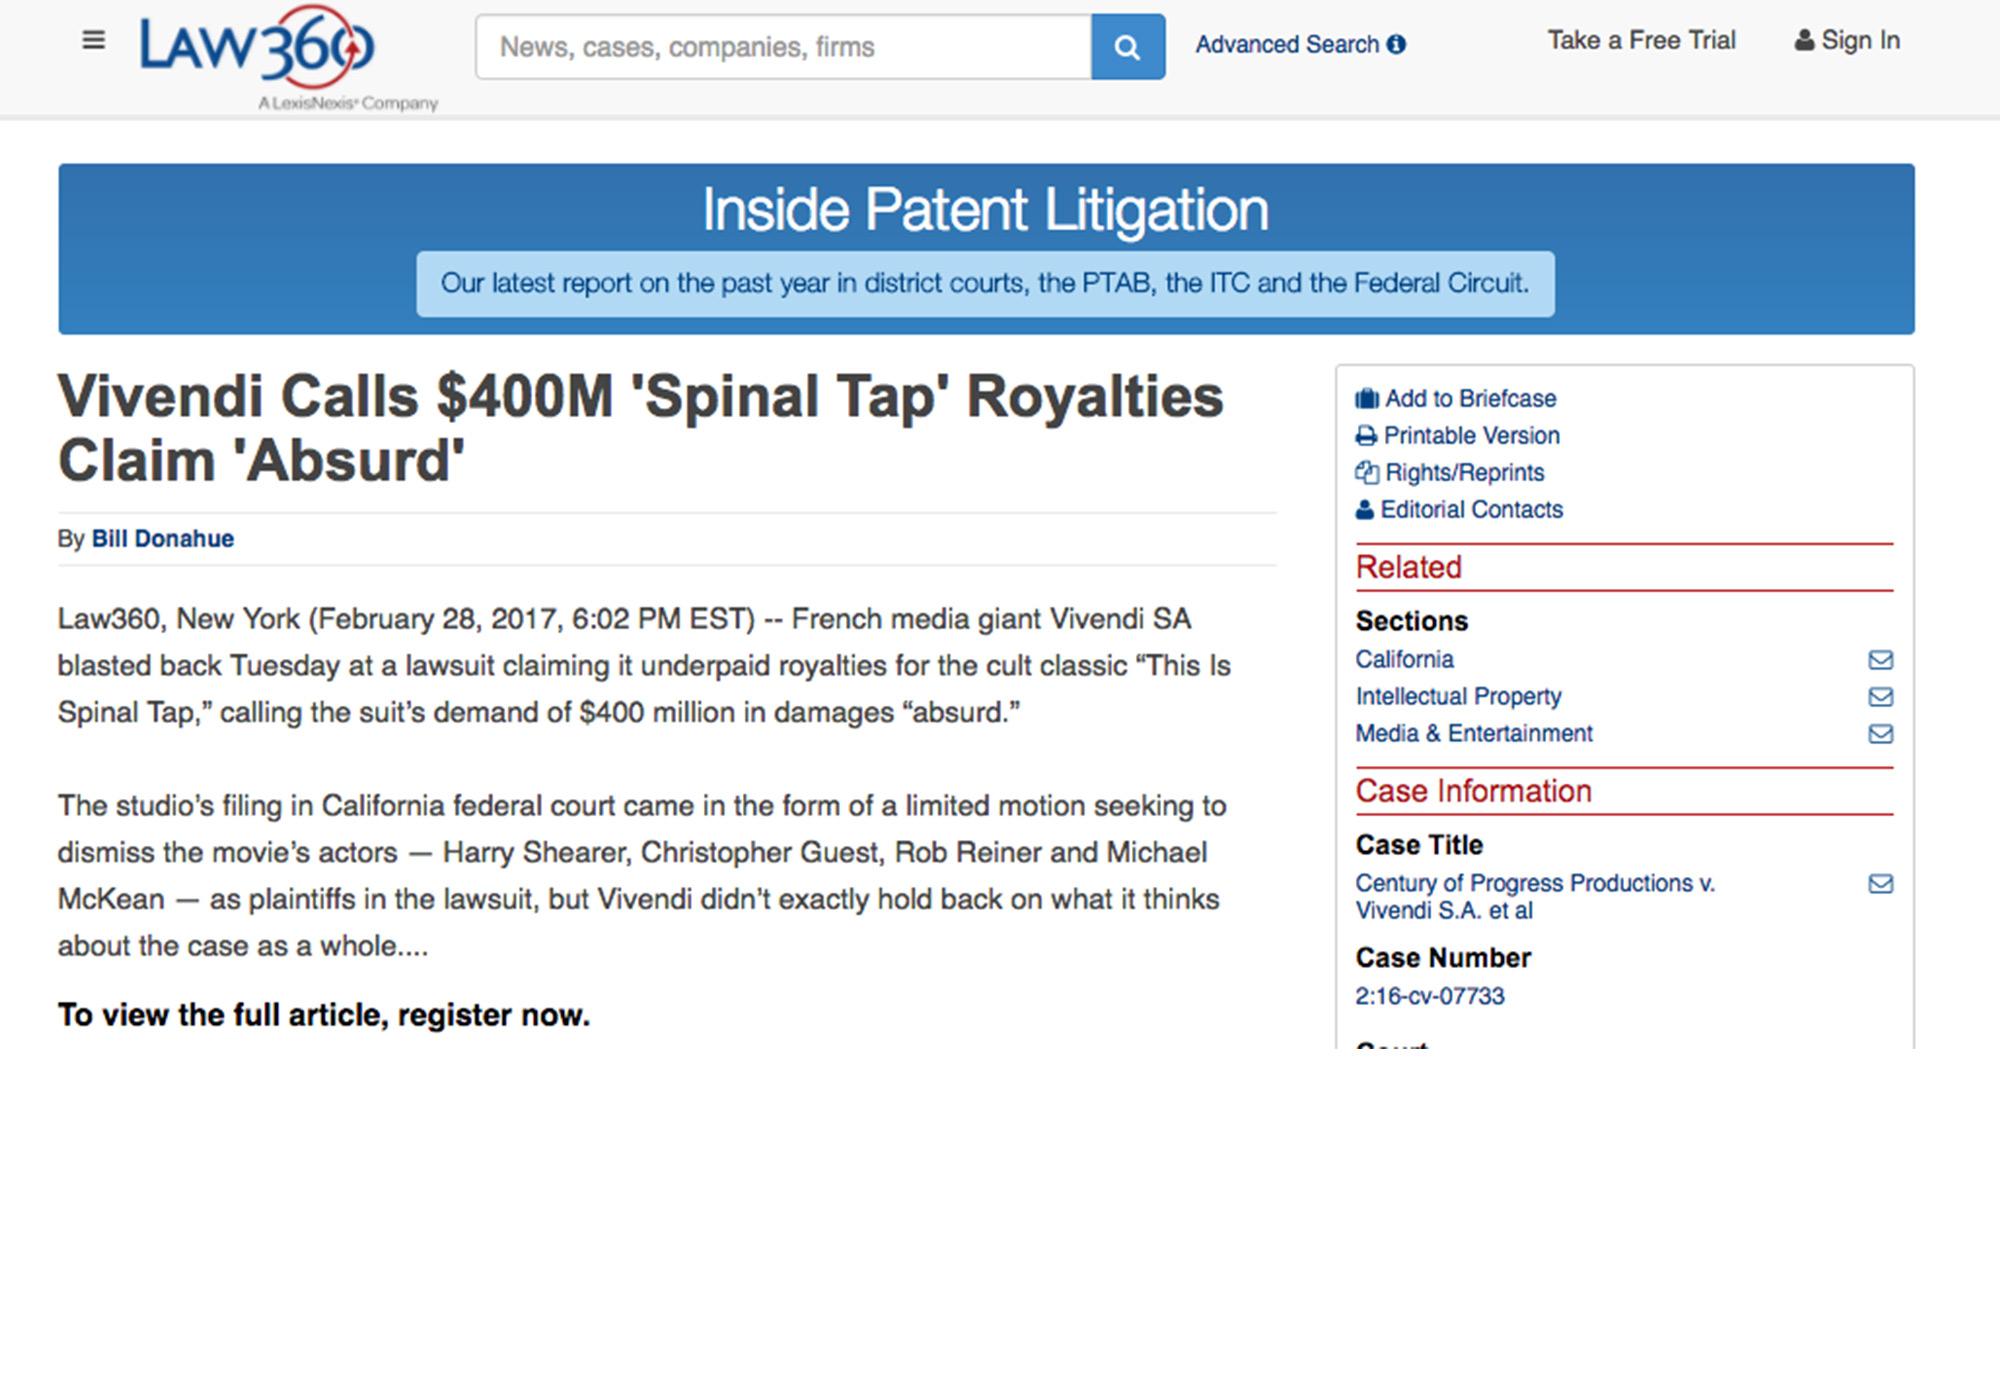 Fairness Rocks News Vivendi Calls $400M 'Spinal Tap' Royalties Claim 'Absurd'